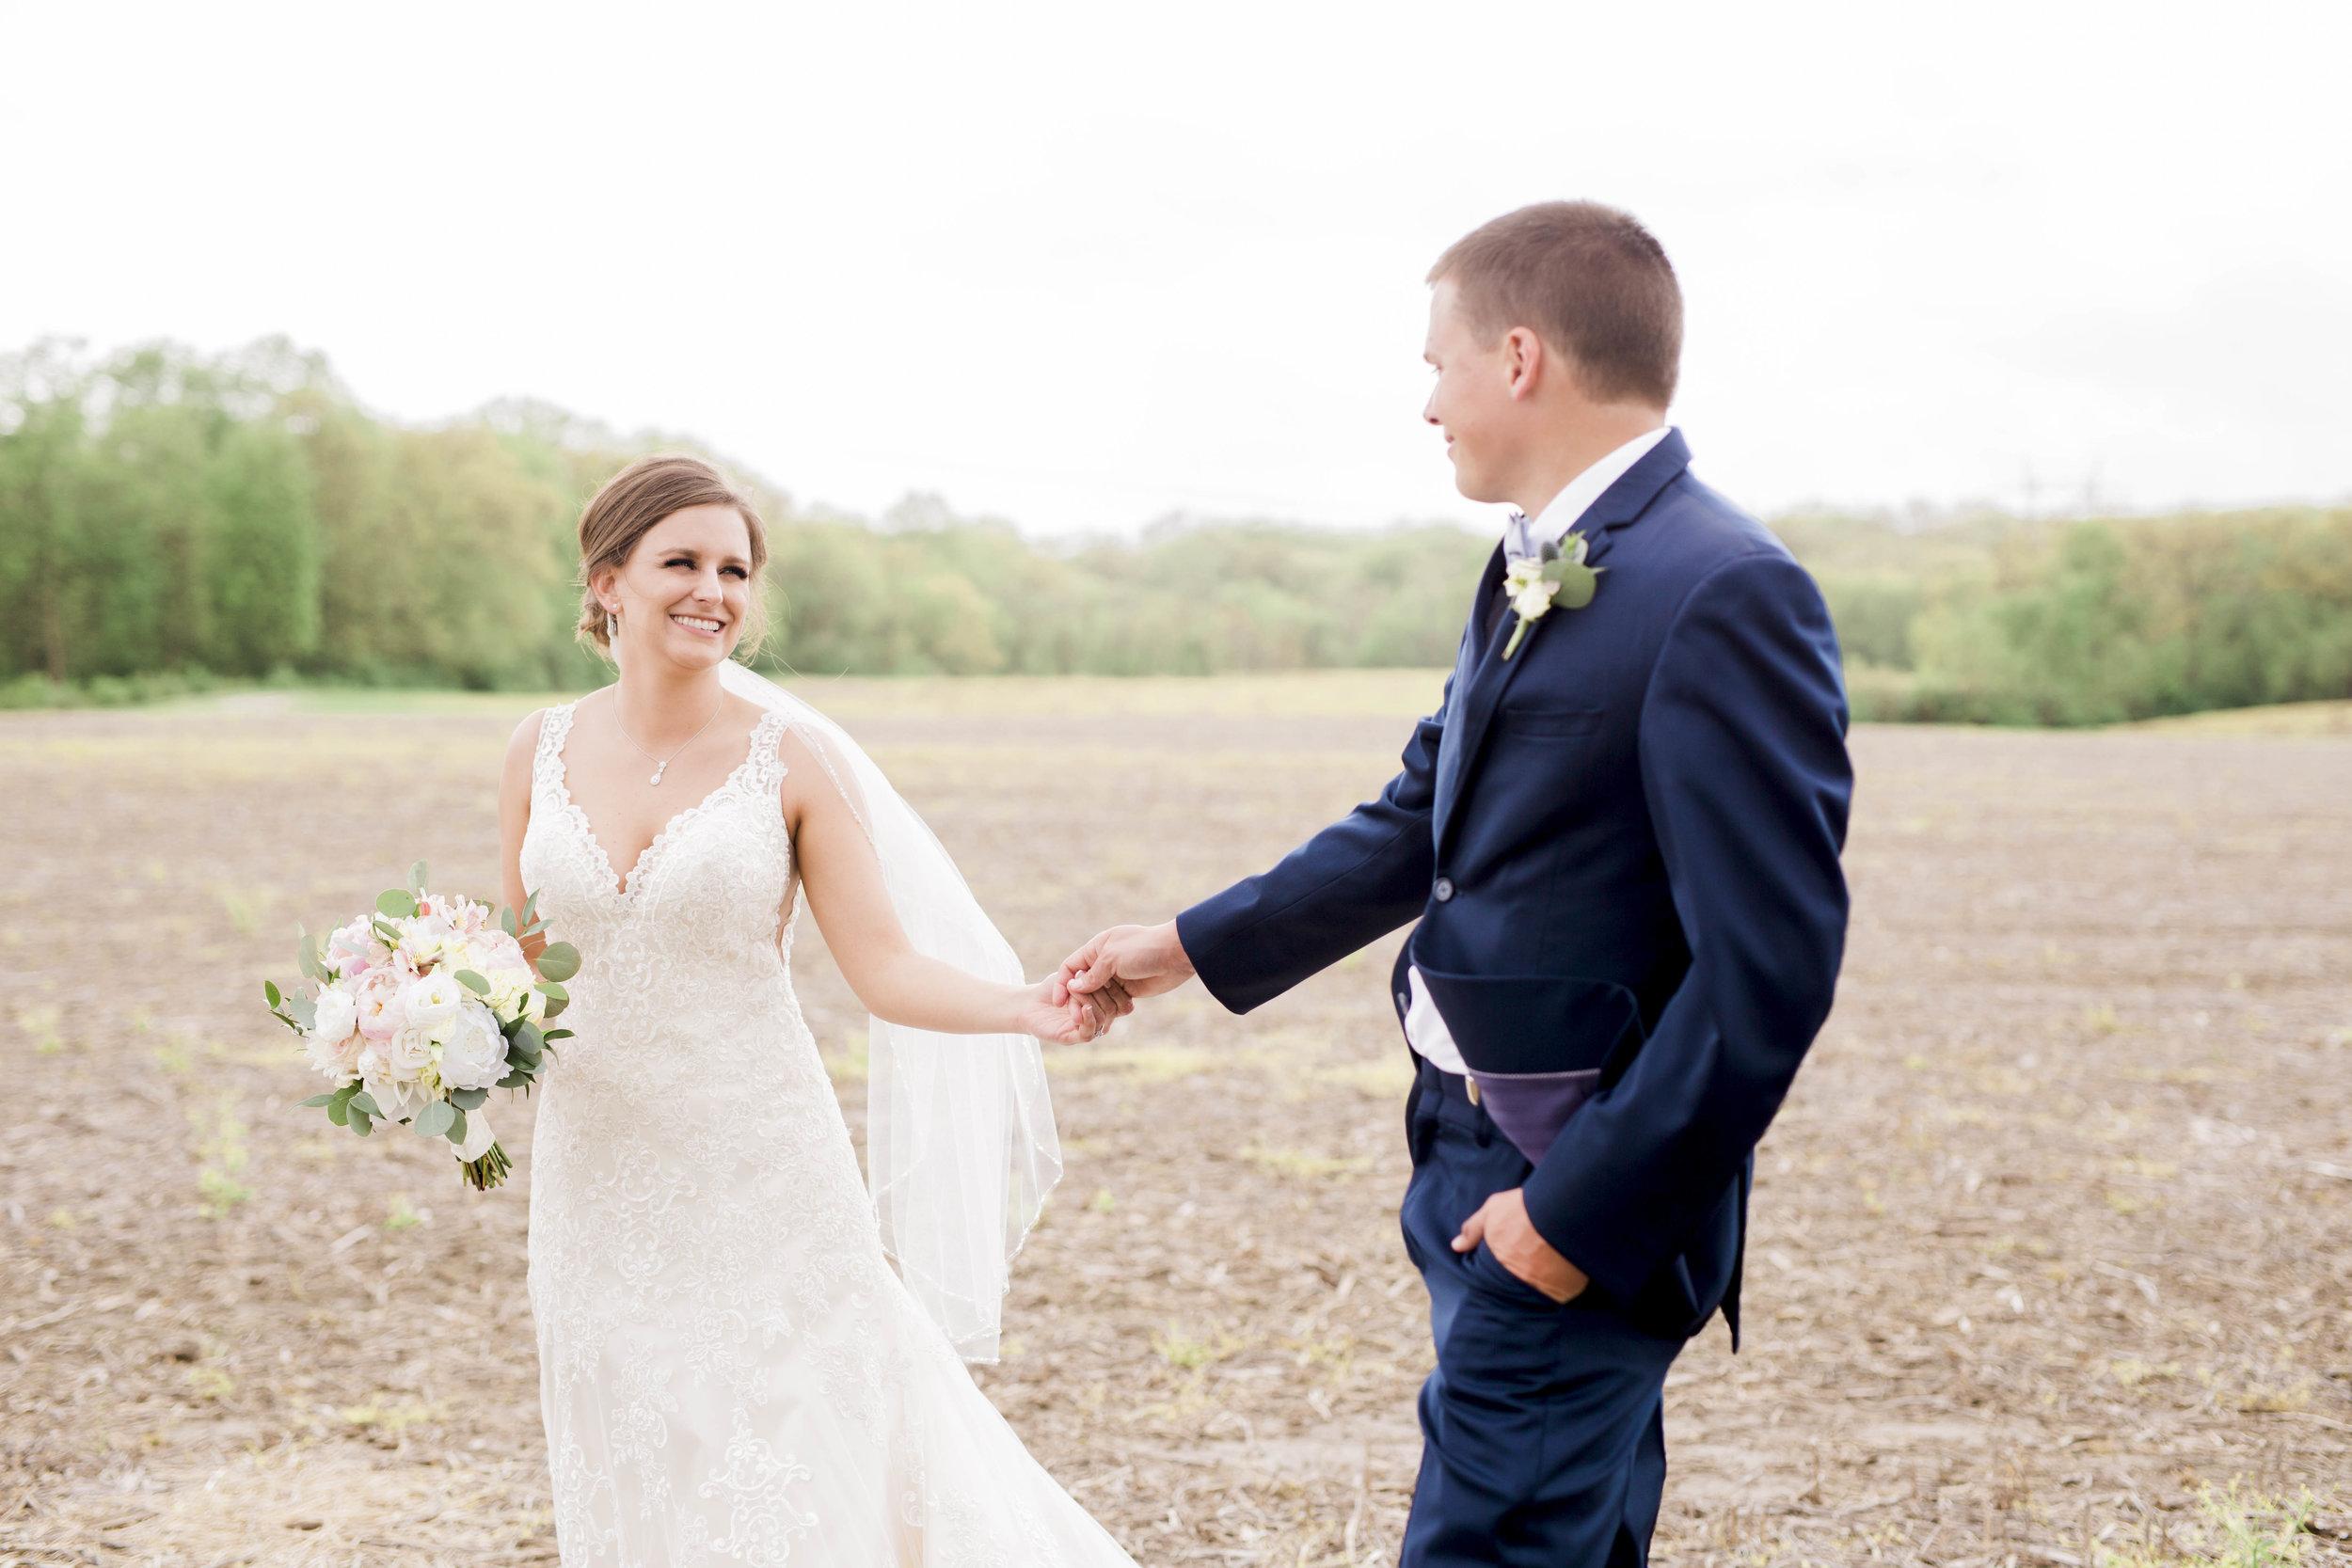 shotbychelsea_wedding_blog-34.jpg